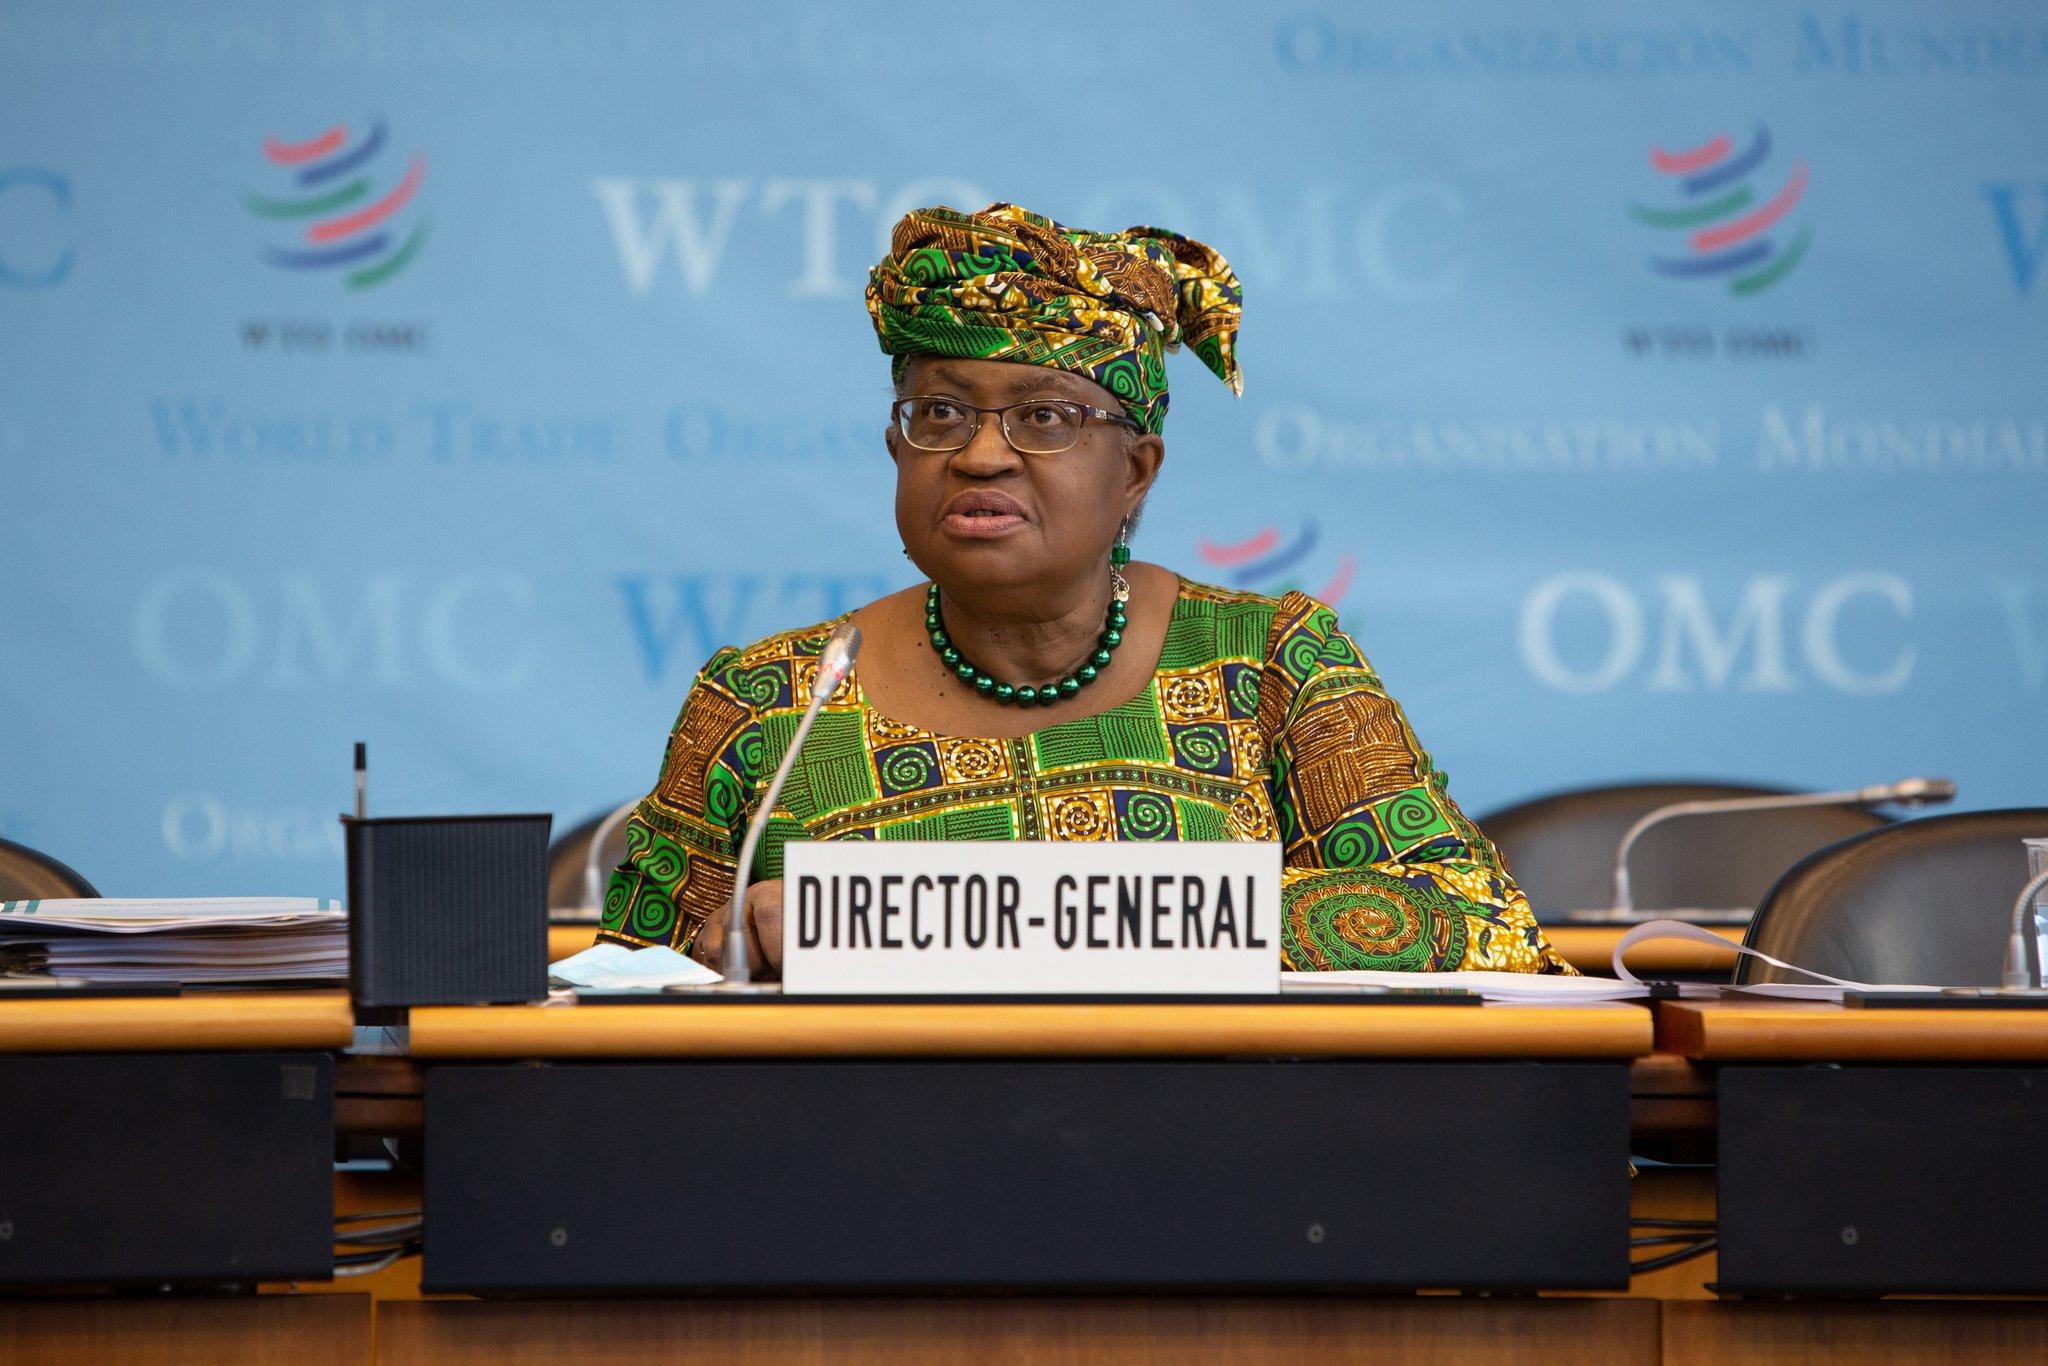 Ngozi Okonjo-Iweala assumes office as first female DG at WTO (Photos)